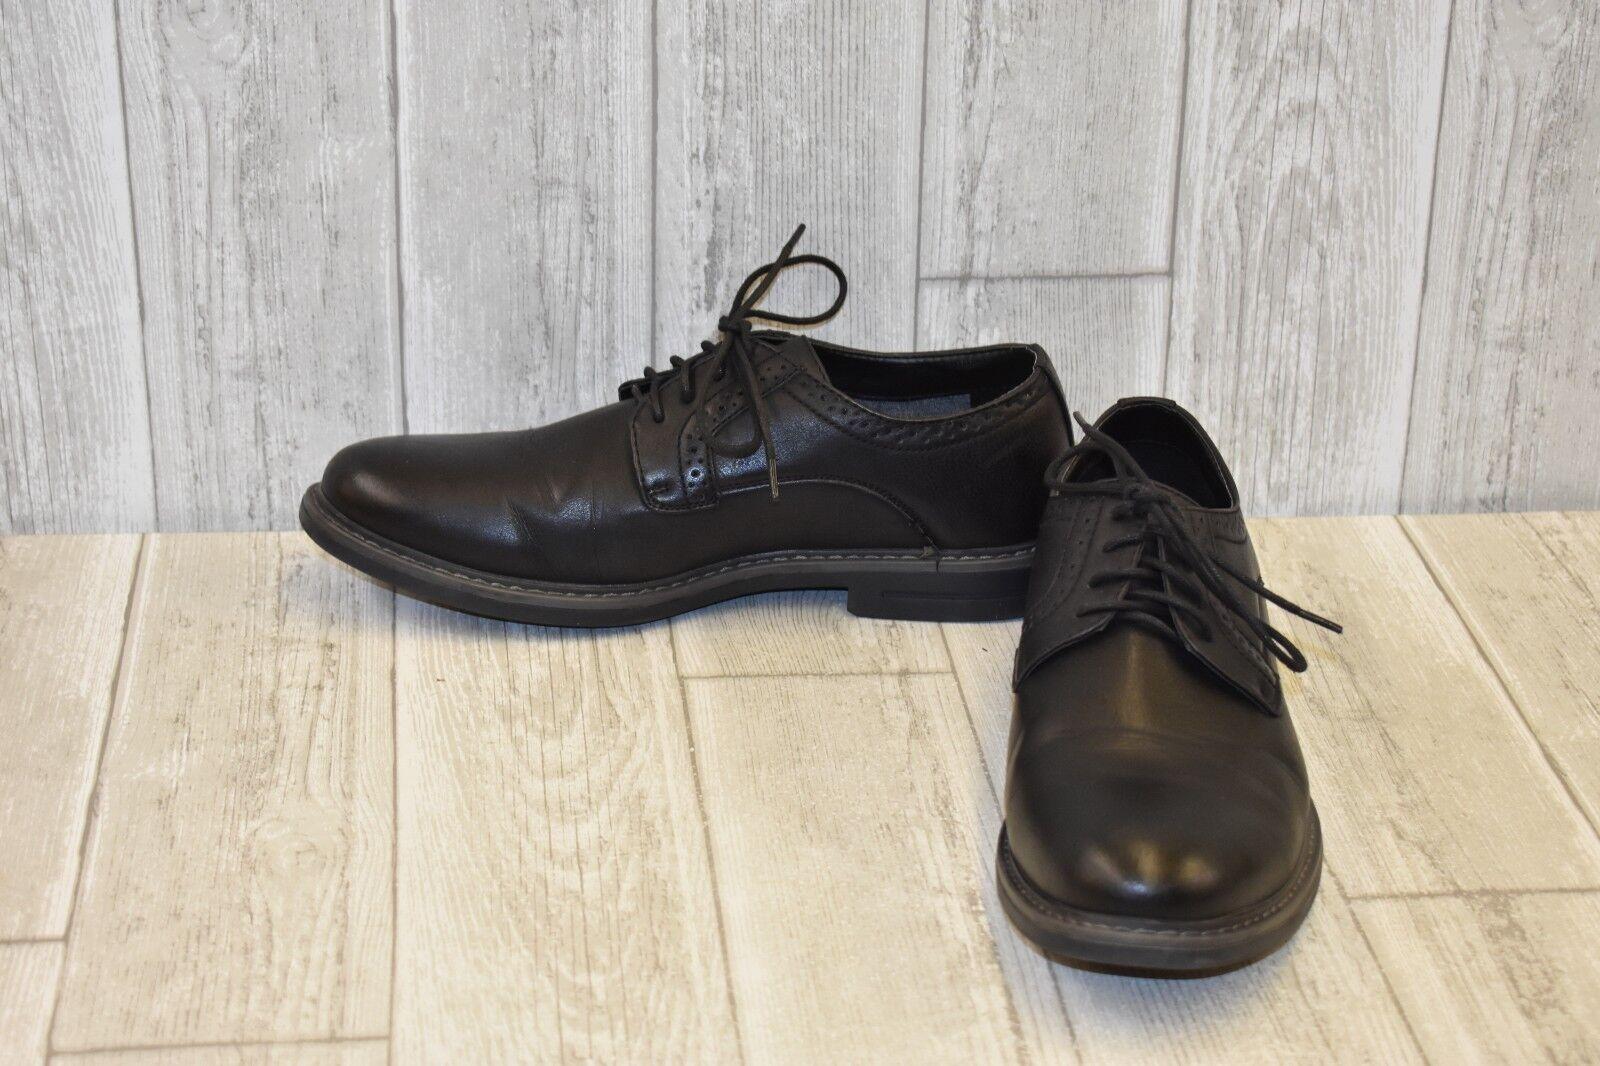 Izod Chad Oxford - Men's Size 10M, Black